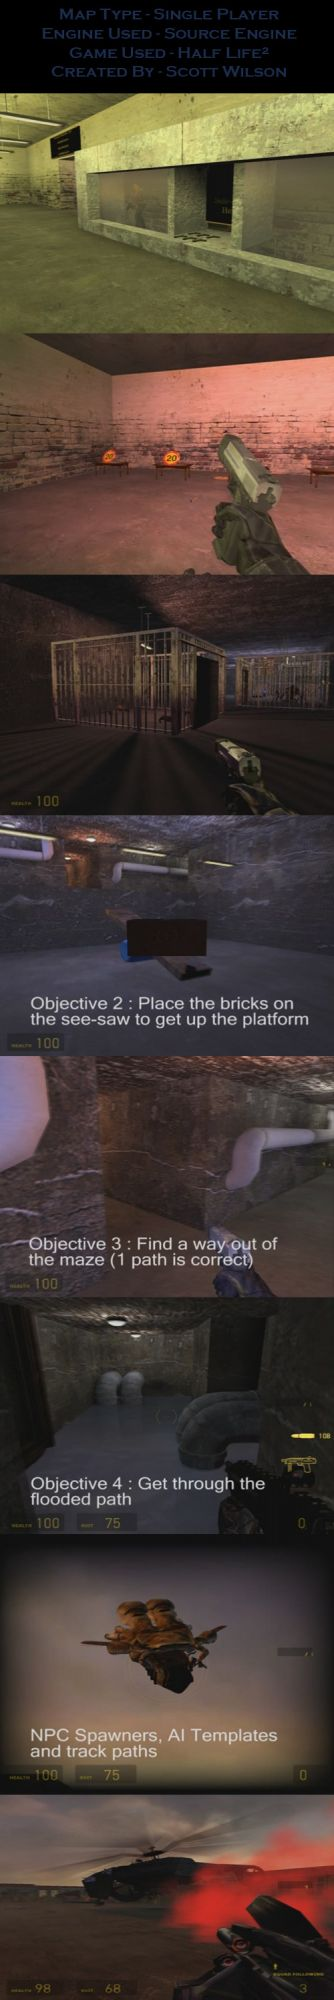 Half Life 2 SP Map